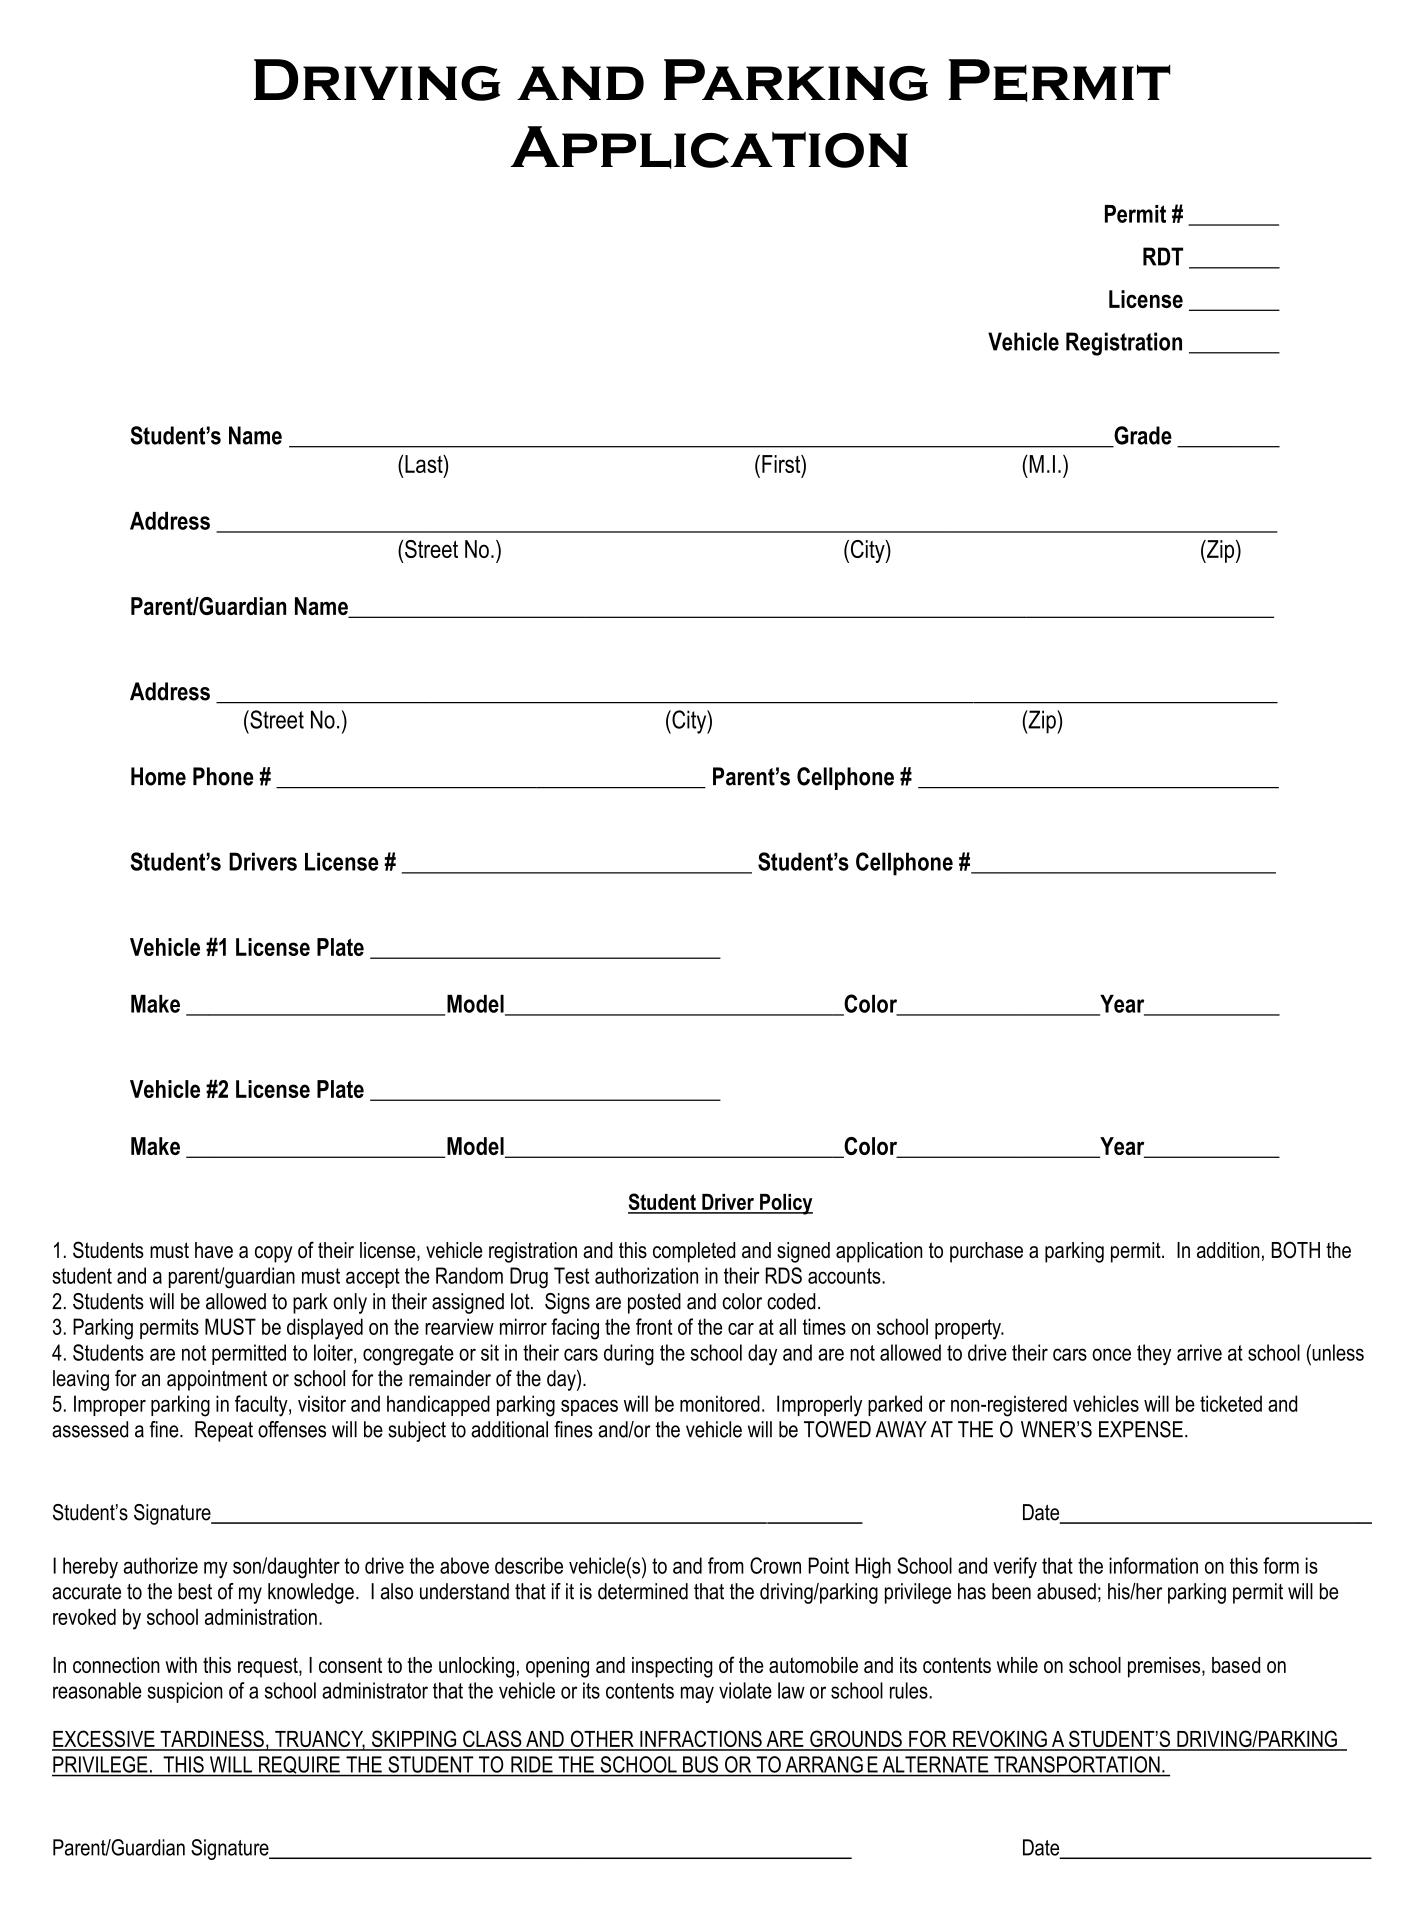 Parking Permit Application Form